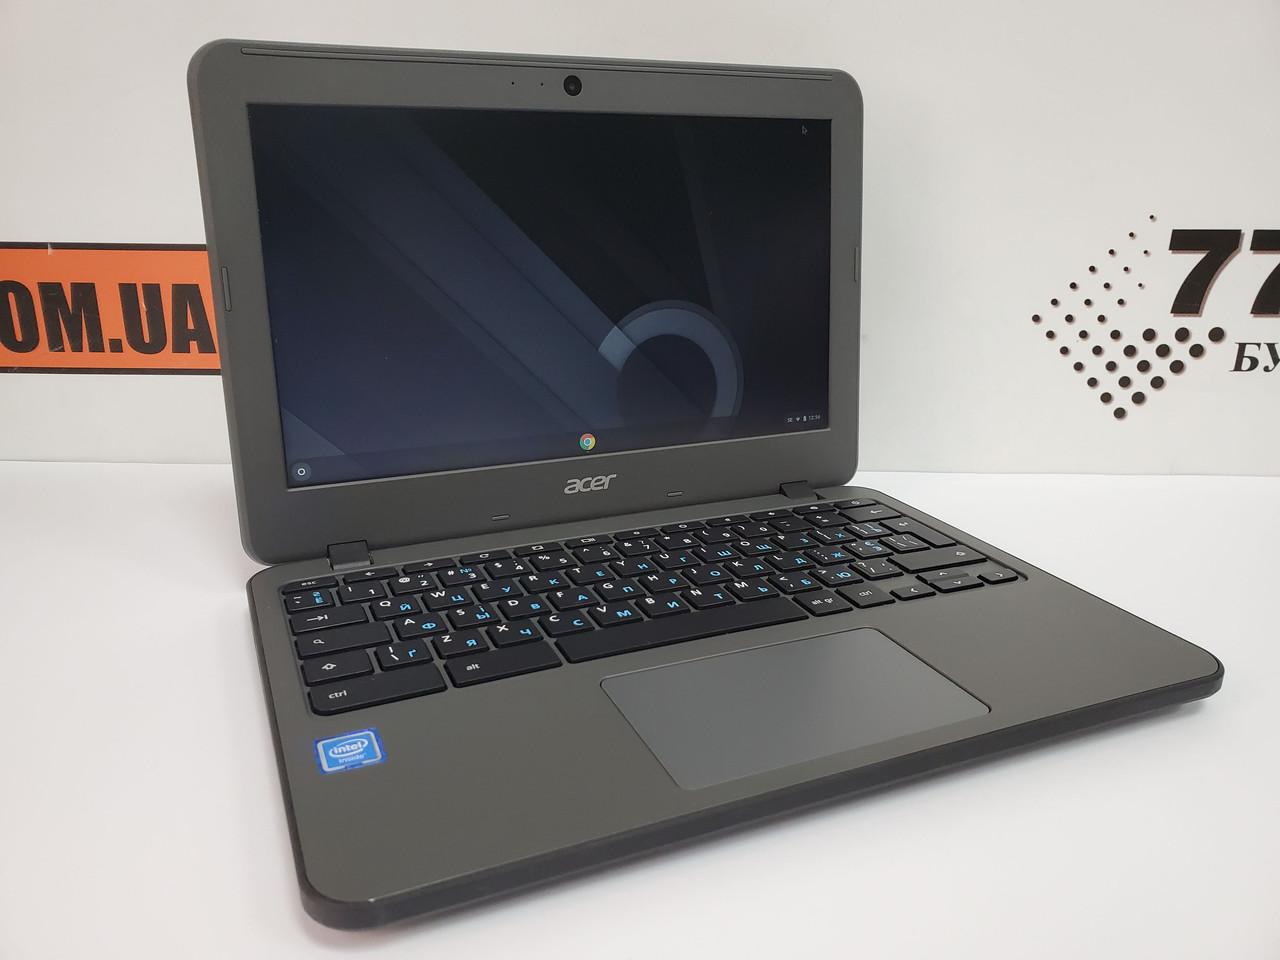 "Нетбук Acer Chromebook C731 N16Q13, 11.6"", Intel Celeron N3060 2x2.48GHz, RAM 4ГБ, eMMC Flash 24ГБ"